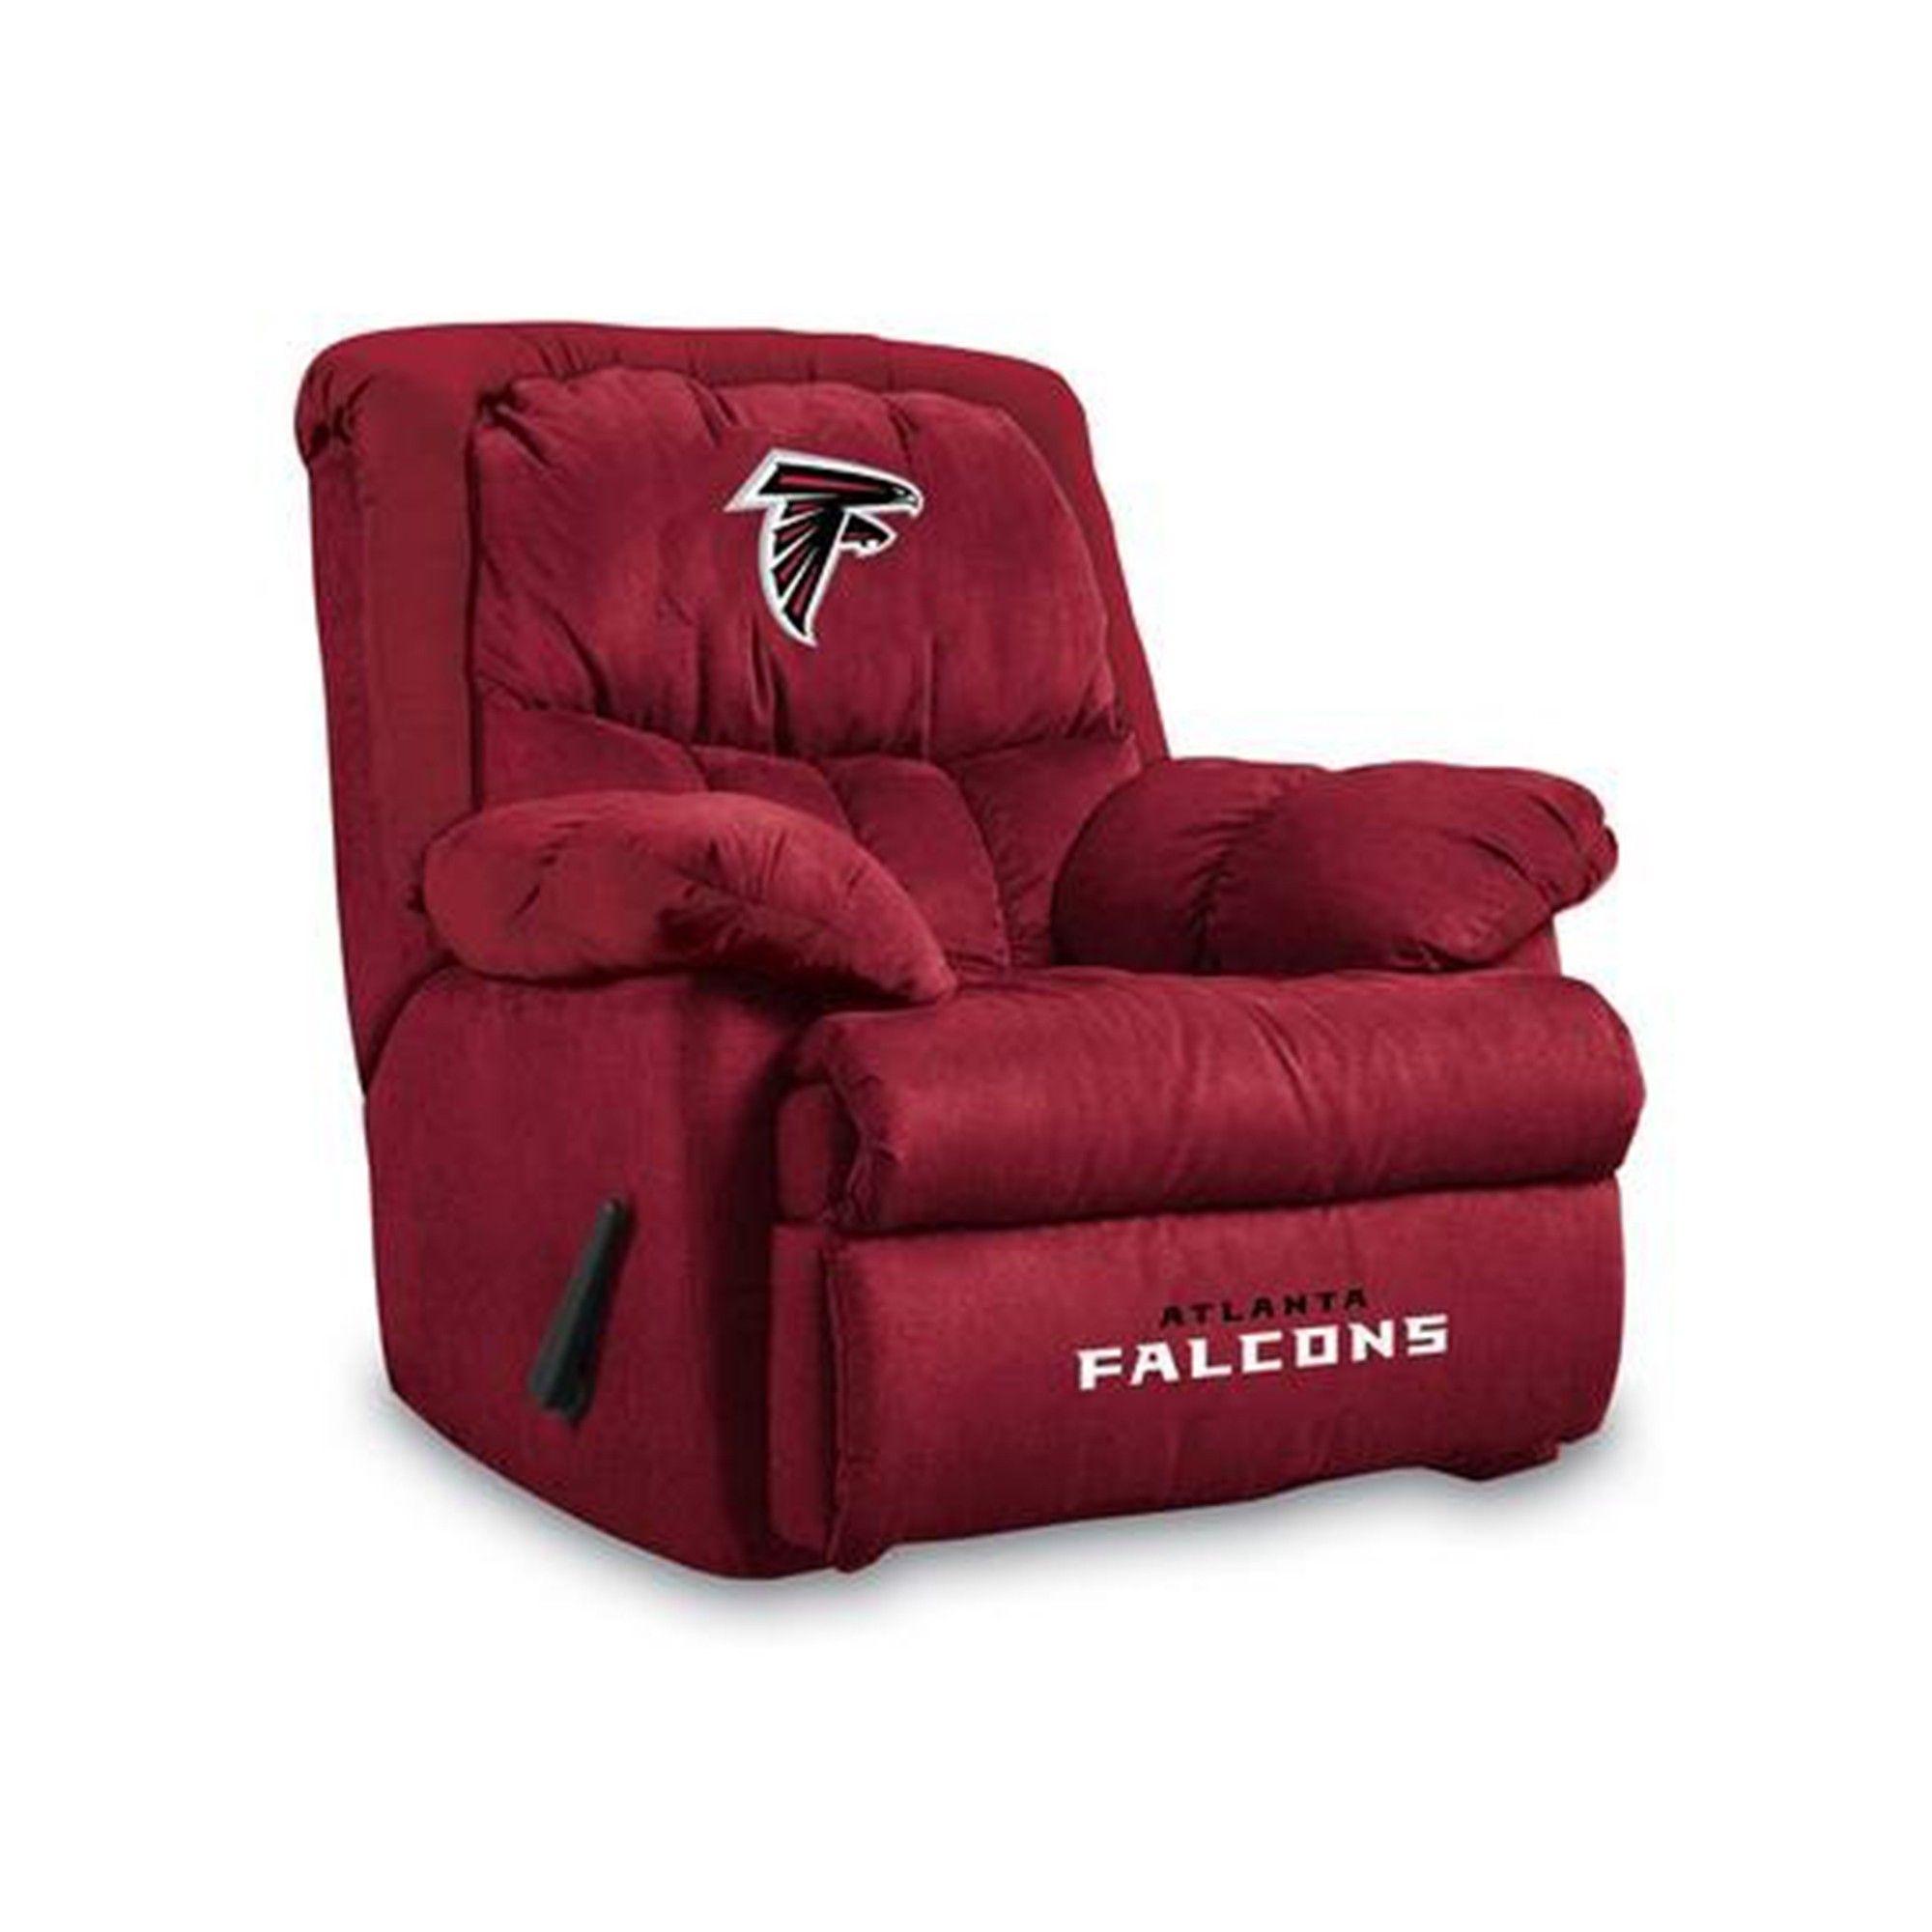 849.99 Brand Atlanta Falcons NFL Official Licensed